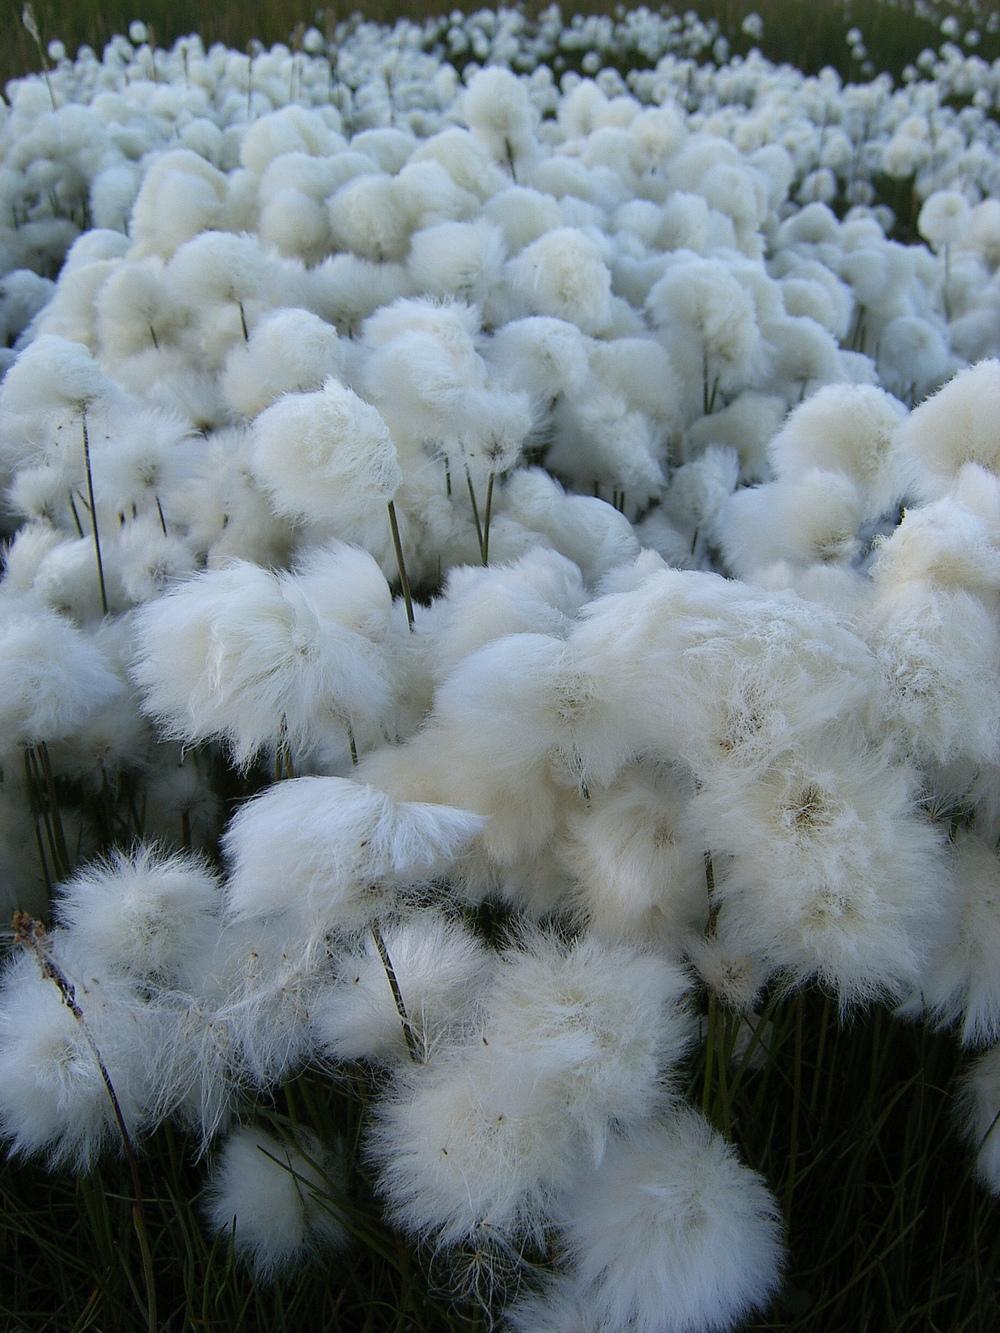 Tundra_cotton_field_2_by_Arctic_Stock.jpg